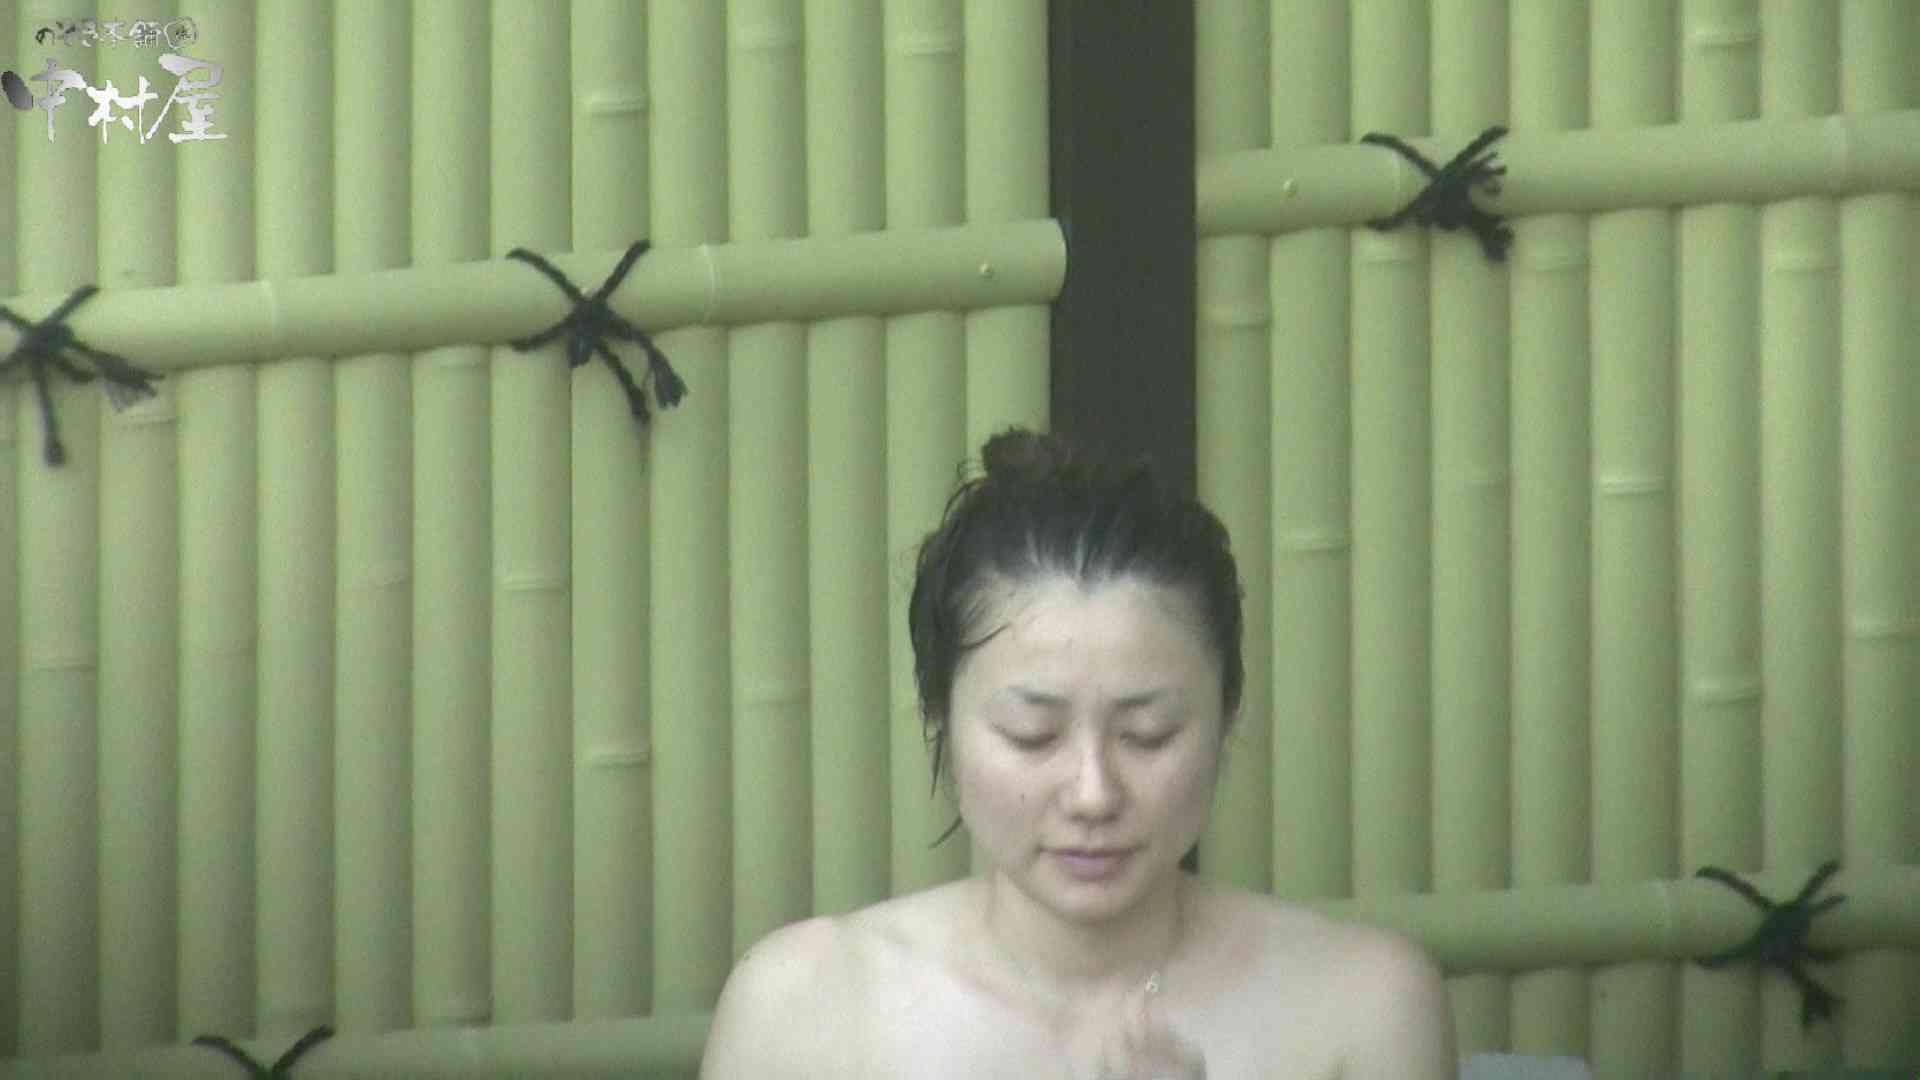 Aquaな露天風呂Vol.969 女体盗撮   OL女体  40連発 19